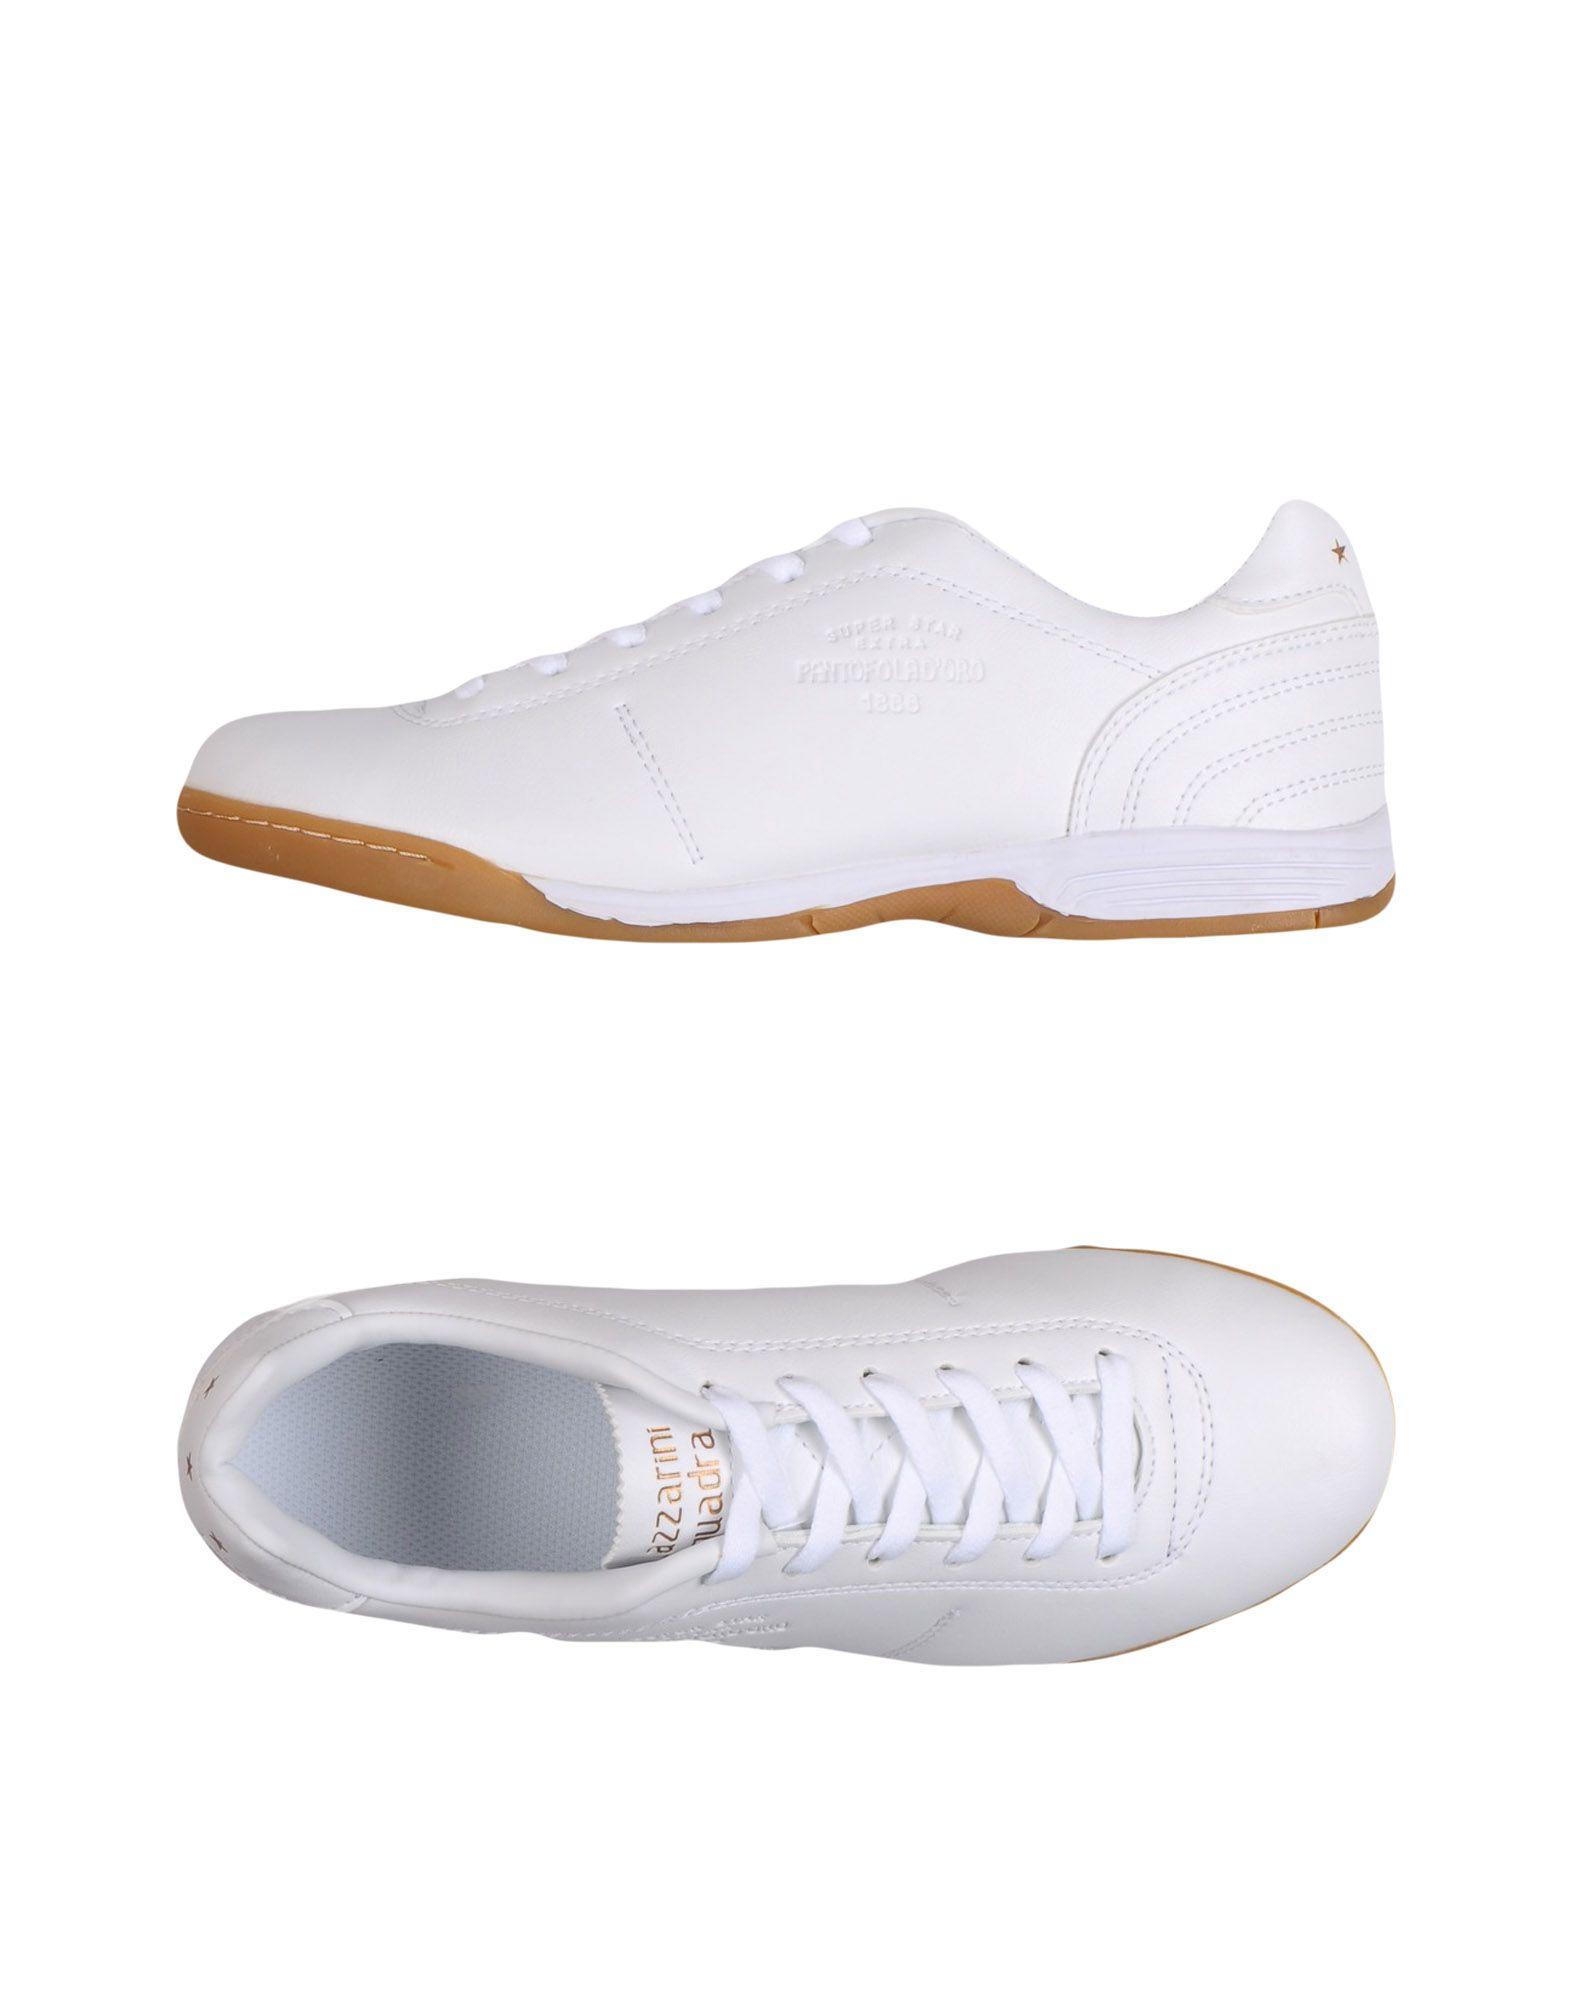 Pantofola D'oro Sneakers Herren  11338685GS Neue Neue Neue Schuhe 8dbb69